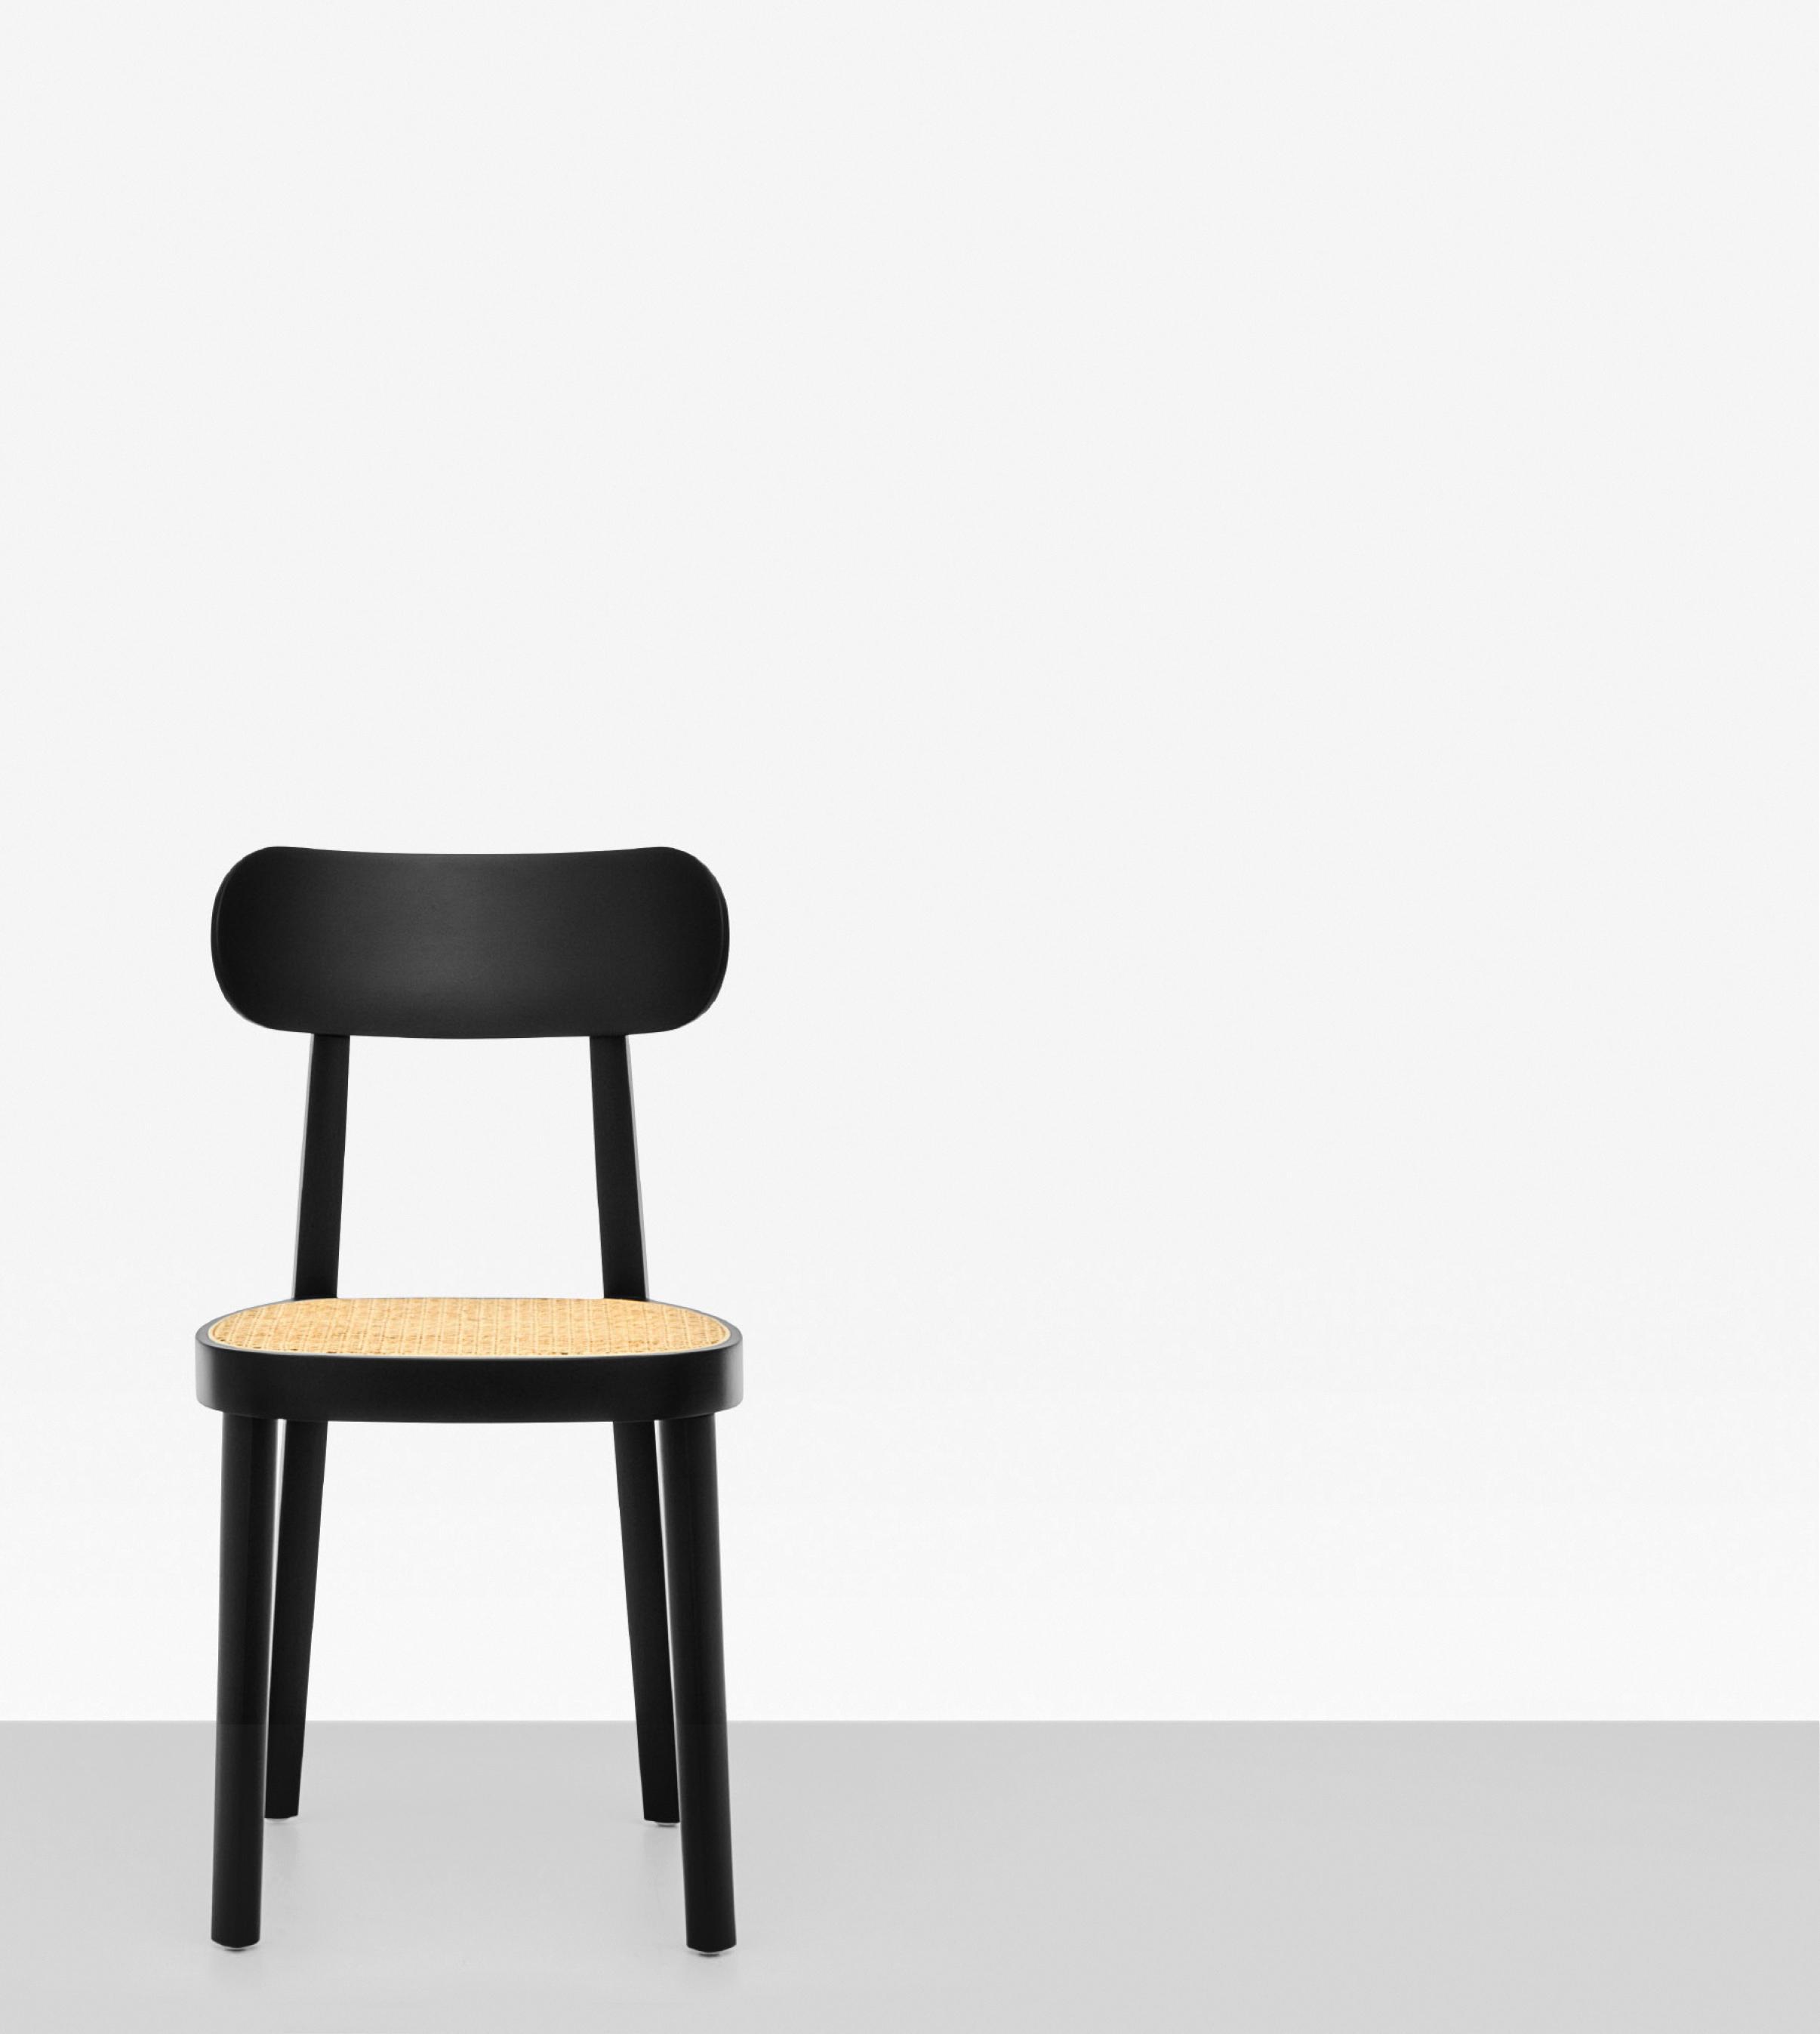 ThonetArchitonic 118 118 von Stühle Stühle lFK1u3TcJ